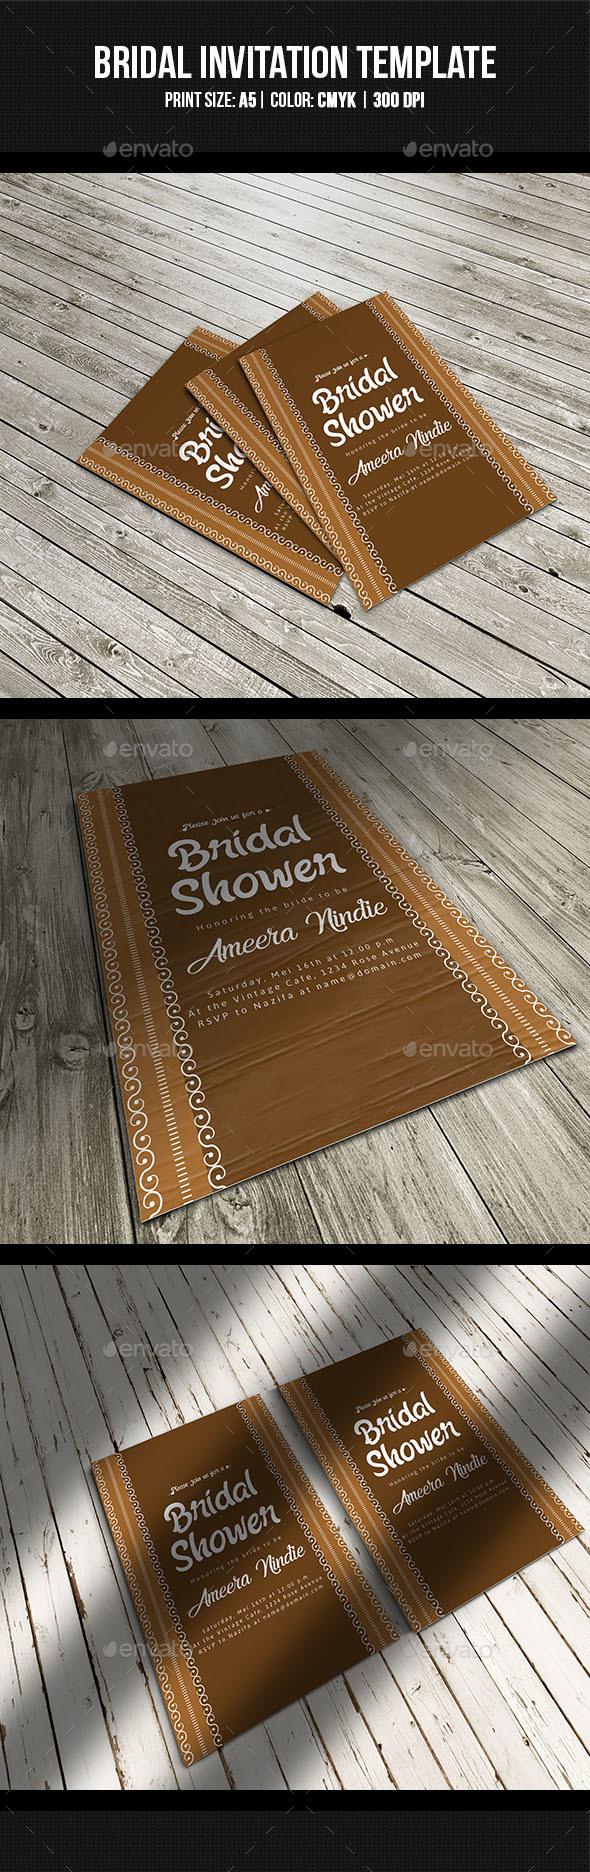 Vintage Bridal Shower Invitation - Cards & Invites Print Templates